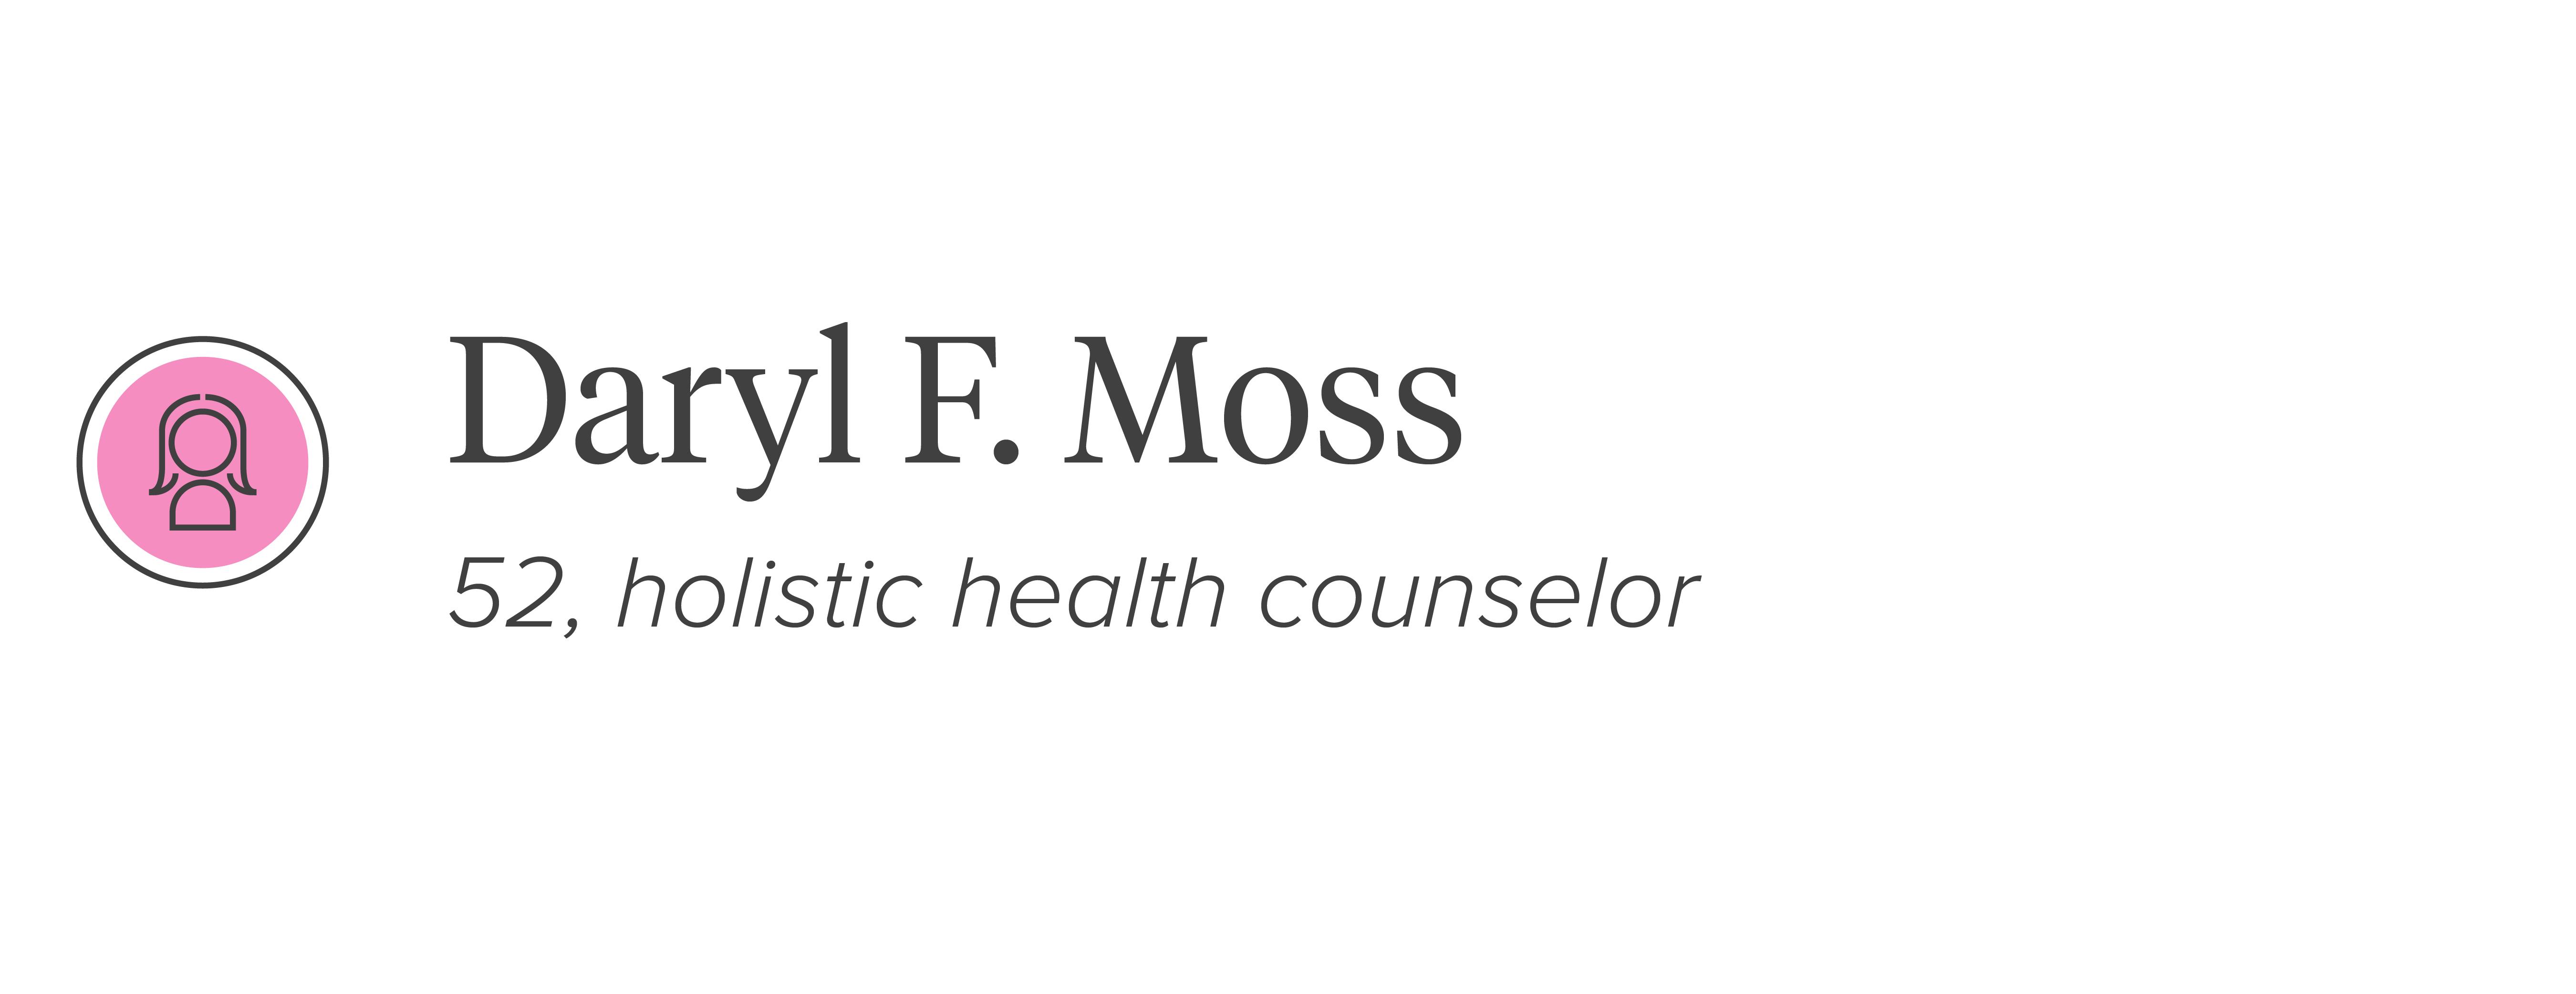 Daryl F. Moss